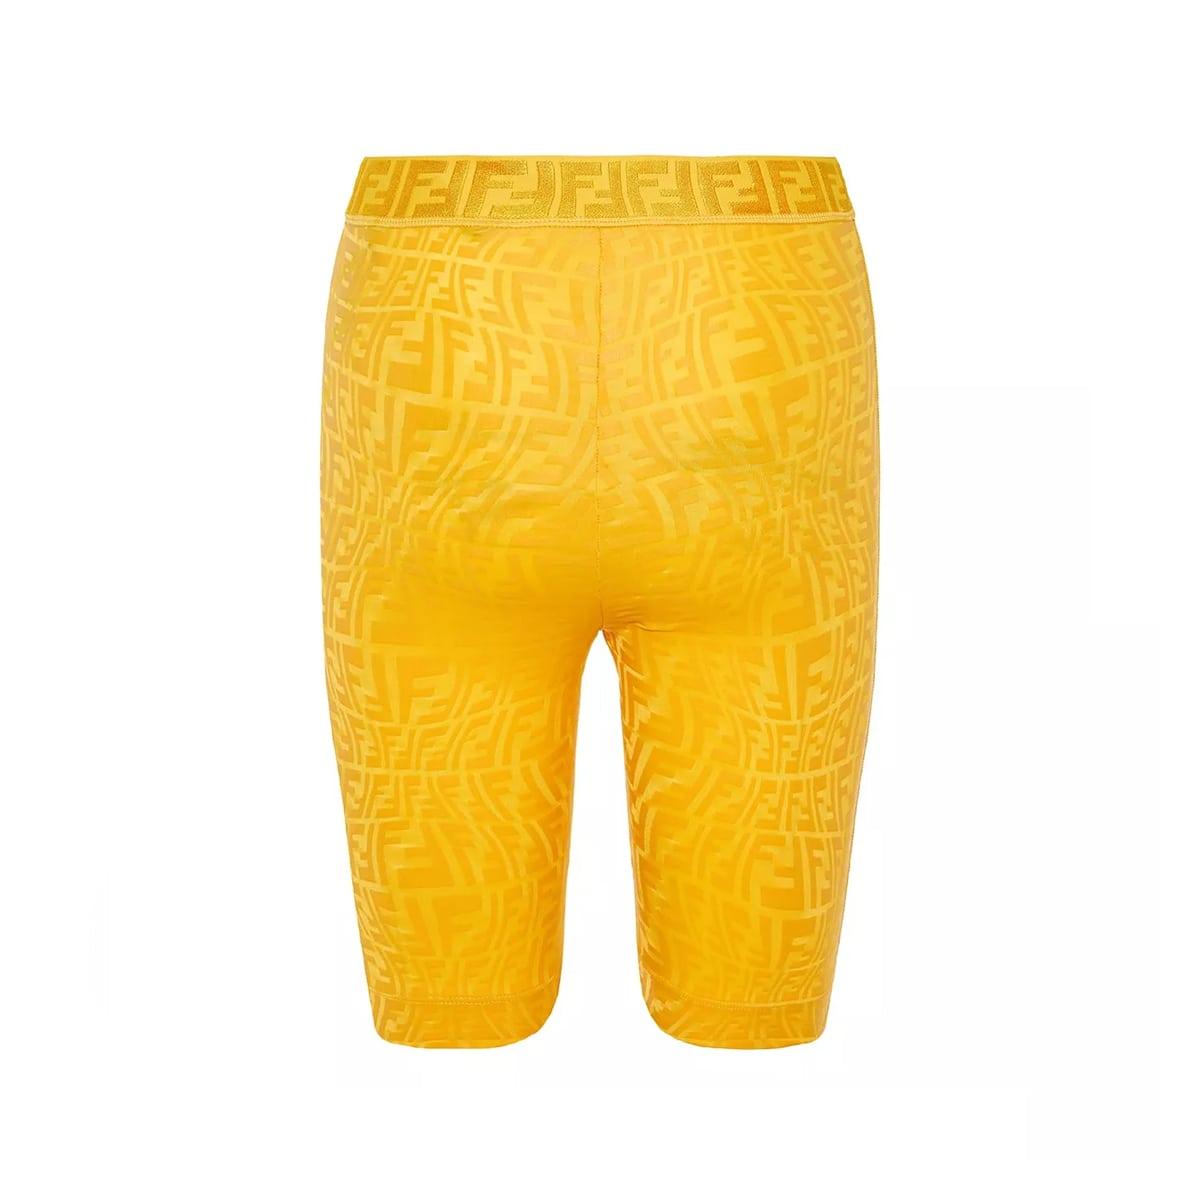 FF cycling shorts